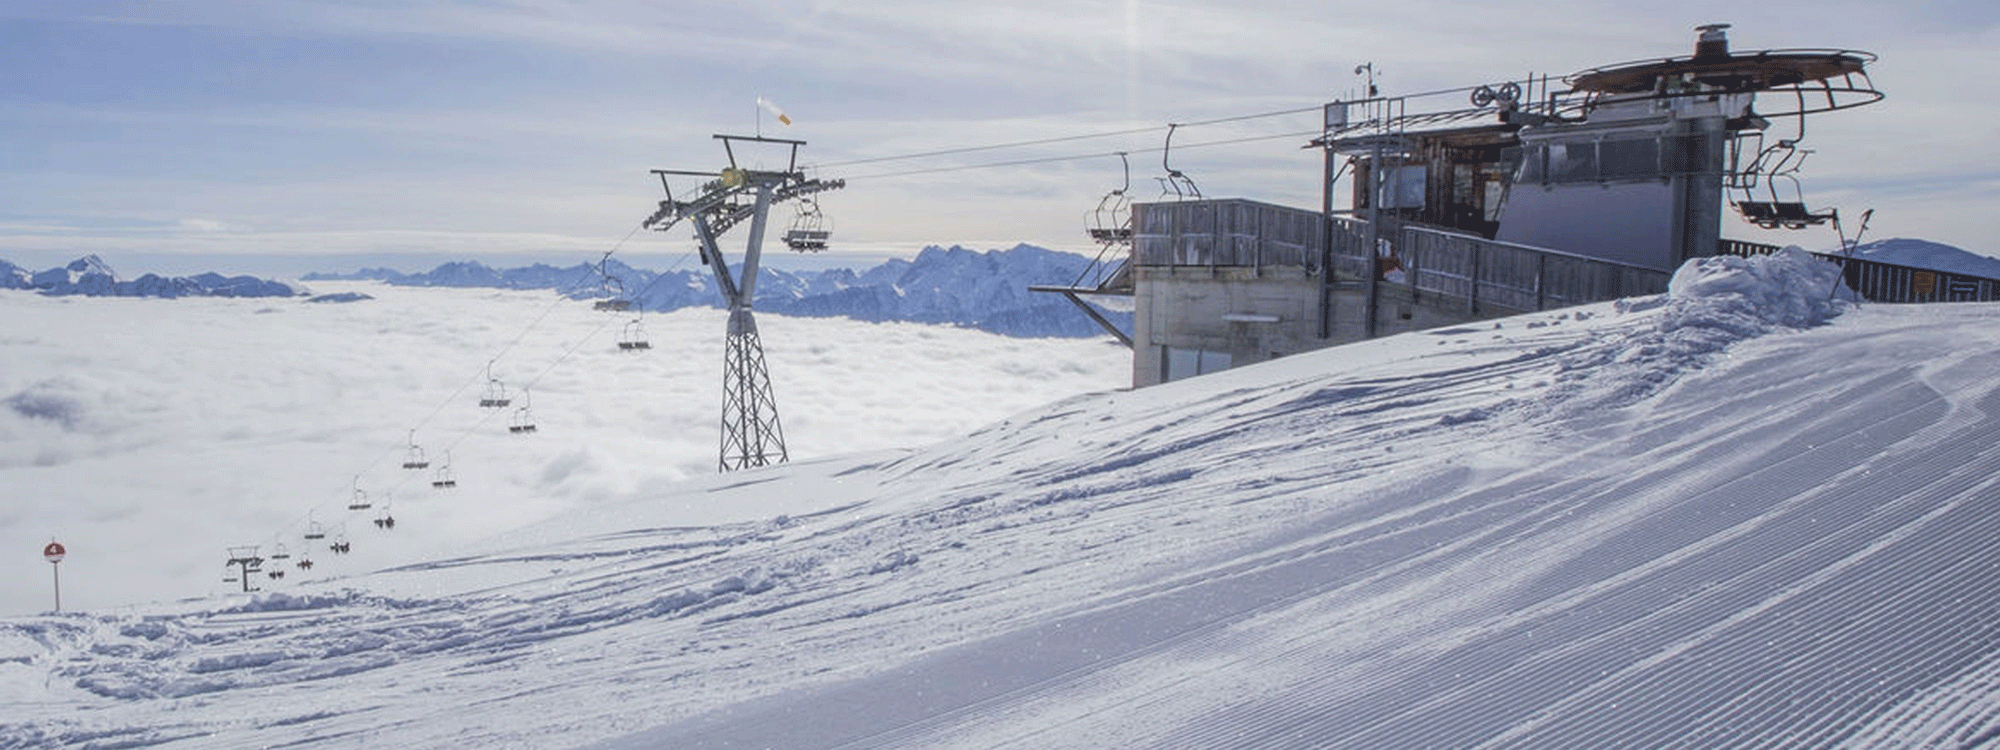 skifahren_sillian2